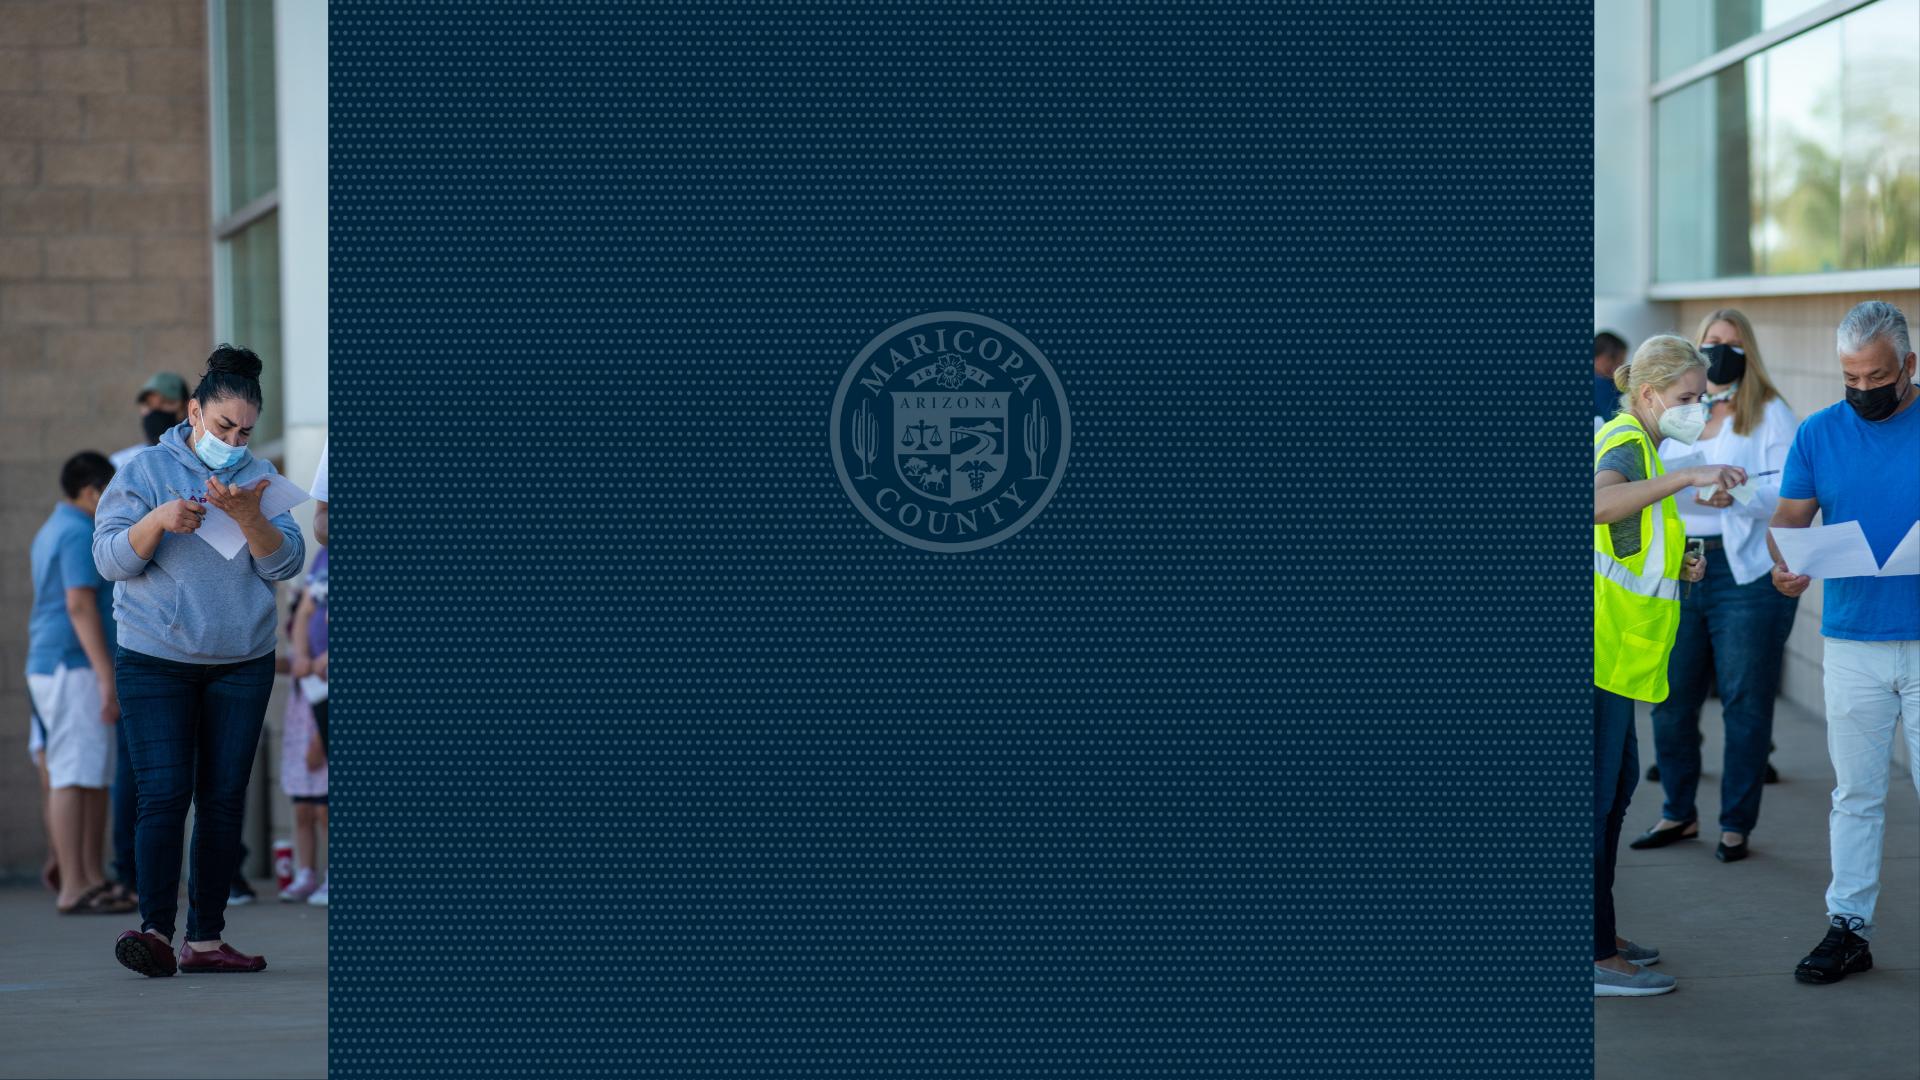 https://cdn.flow.page/images/493b5ab0-332c-4661-a2d3-75e2e14402ef-background?m=1619054202